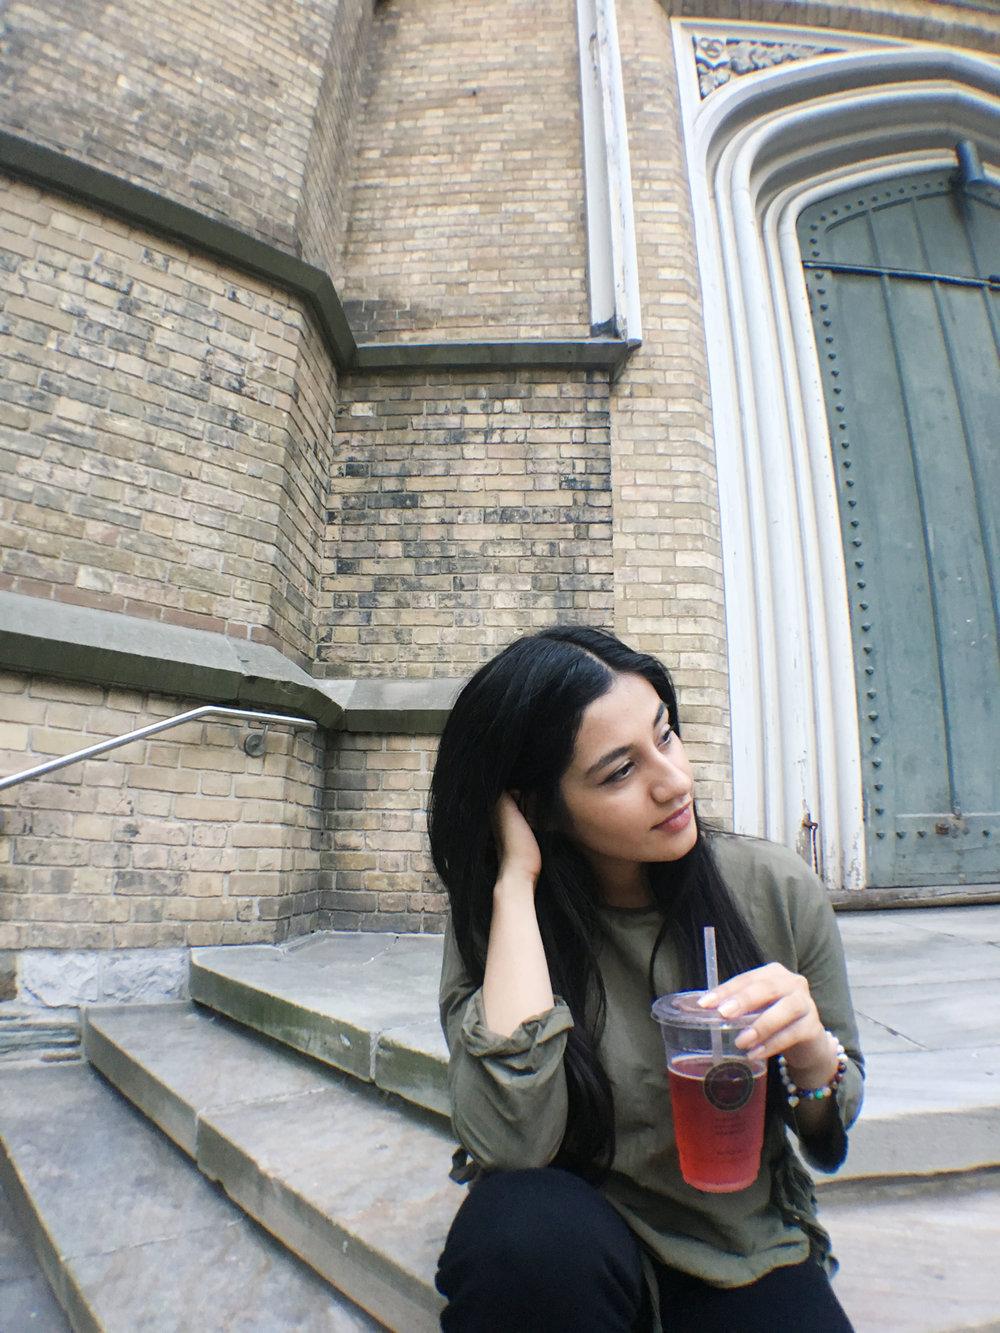 Toronto Eaton Center with the Fruit Sensation Tea Soda - Infuse Menu